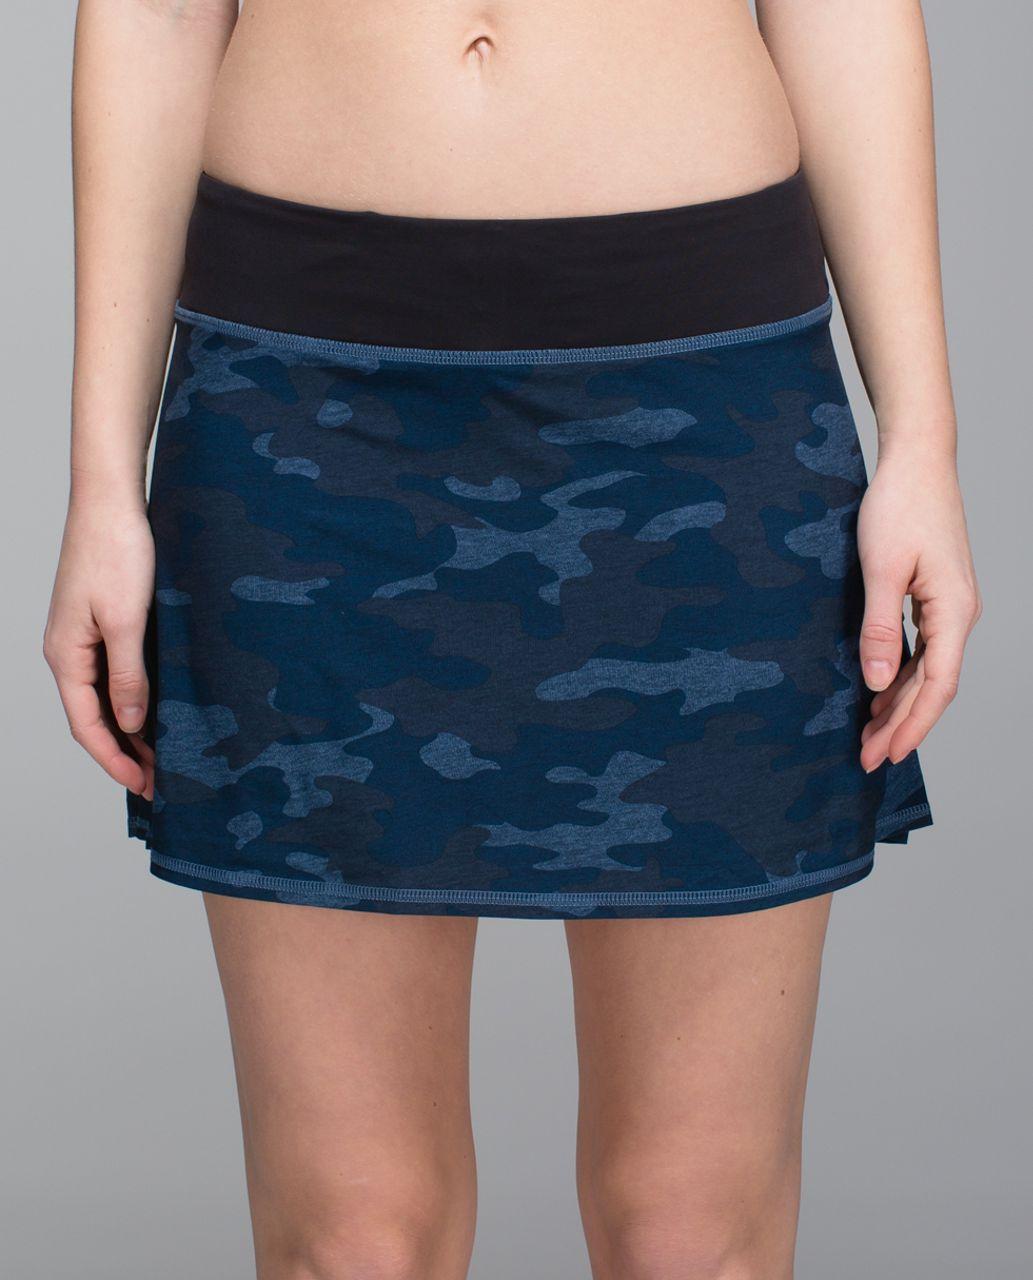 Lululemon Run:  Pace Setter Skirt *4-way Stretch (Tall) - Heathered Texture Lotus Camo Oil Slick Blue / Black